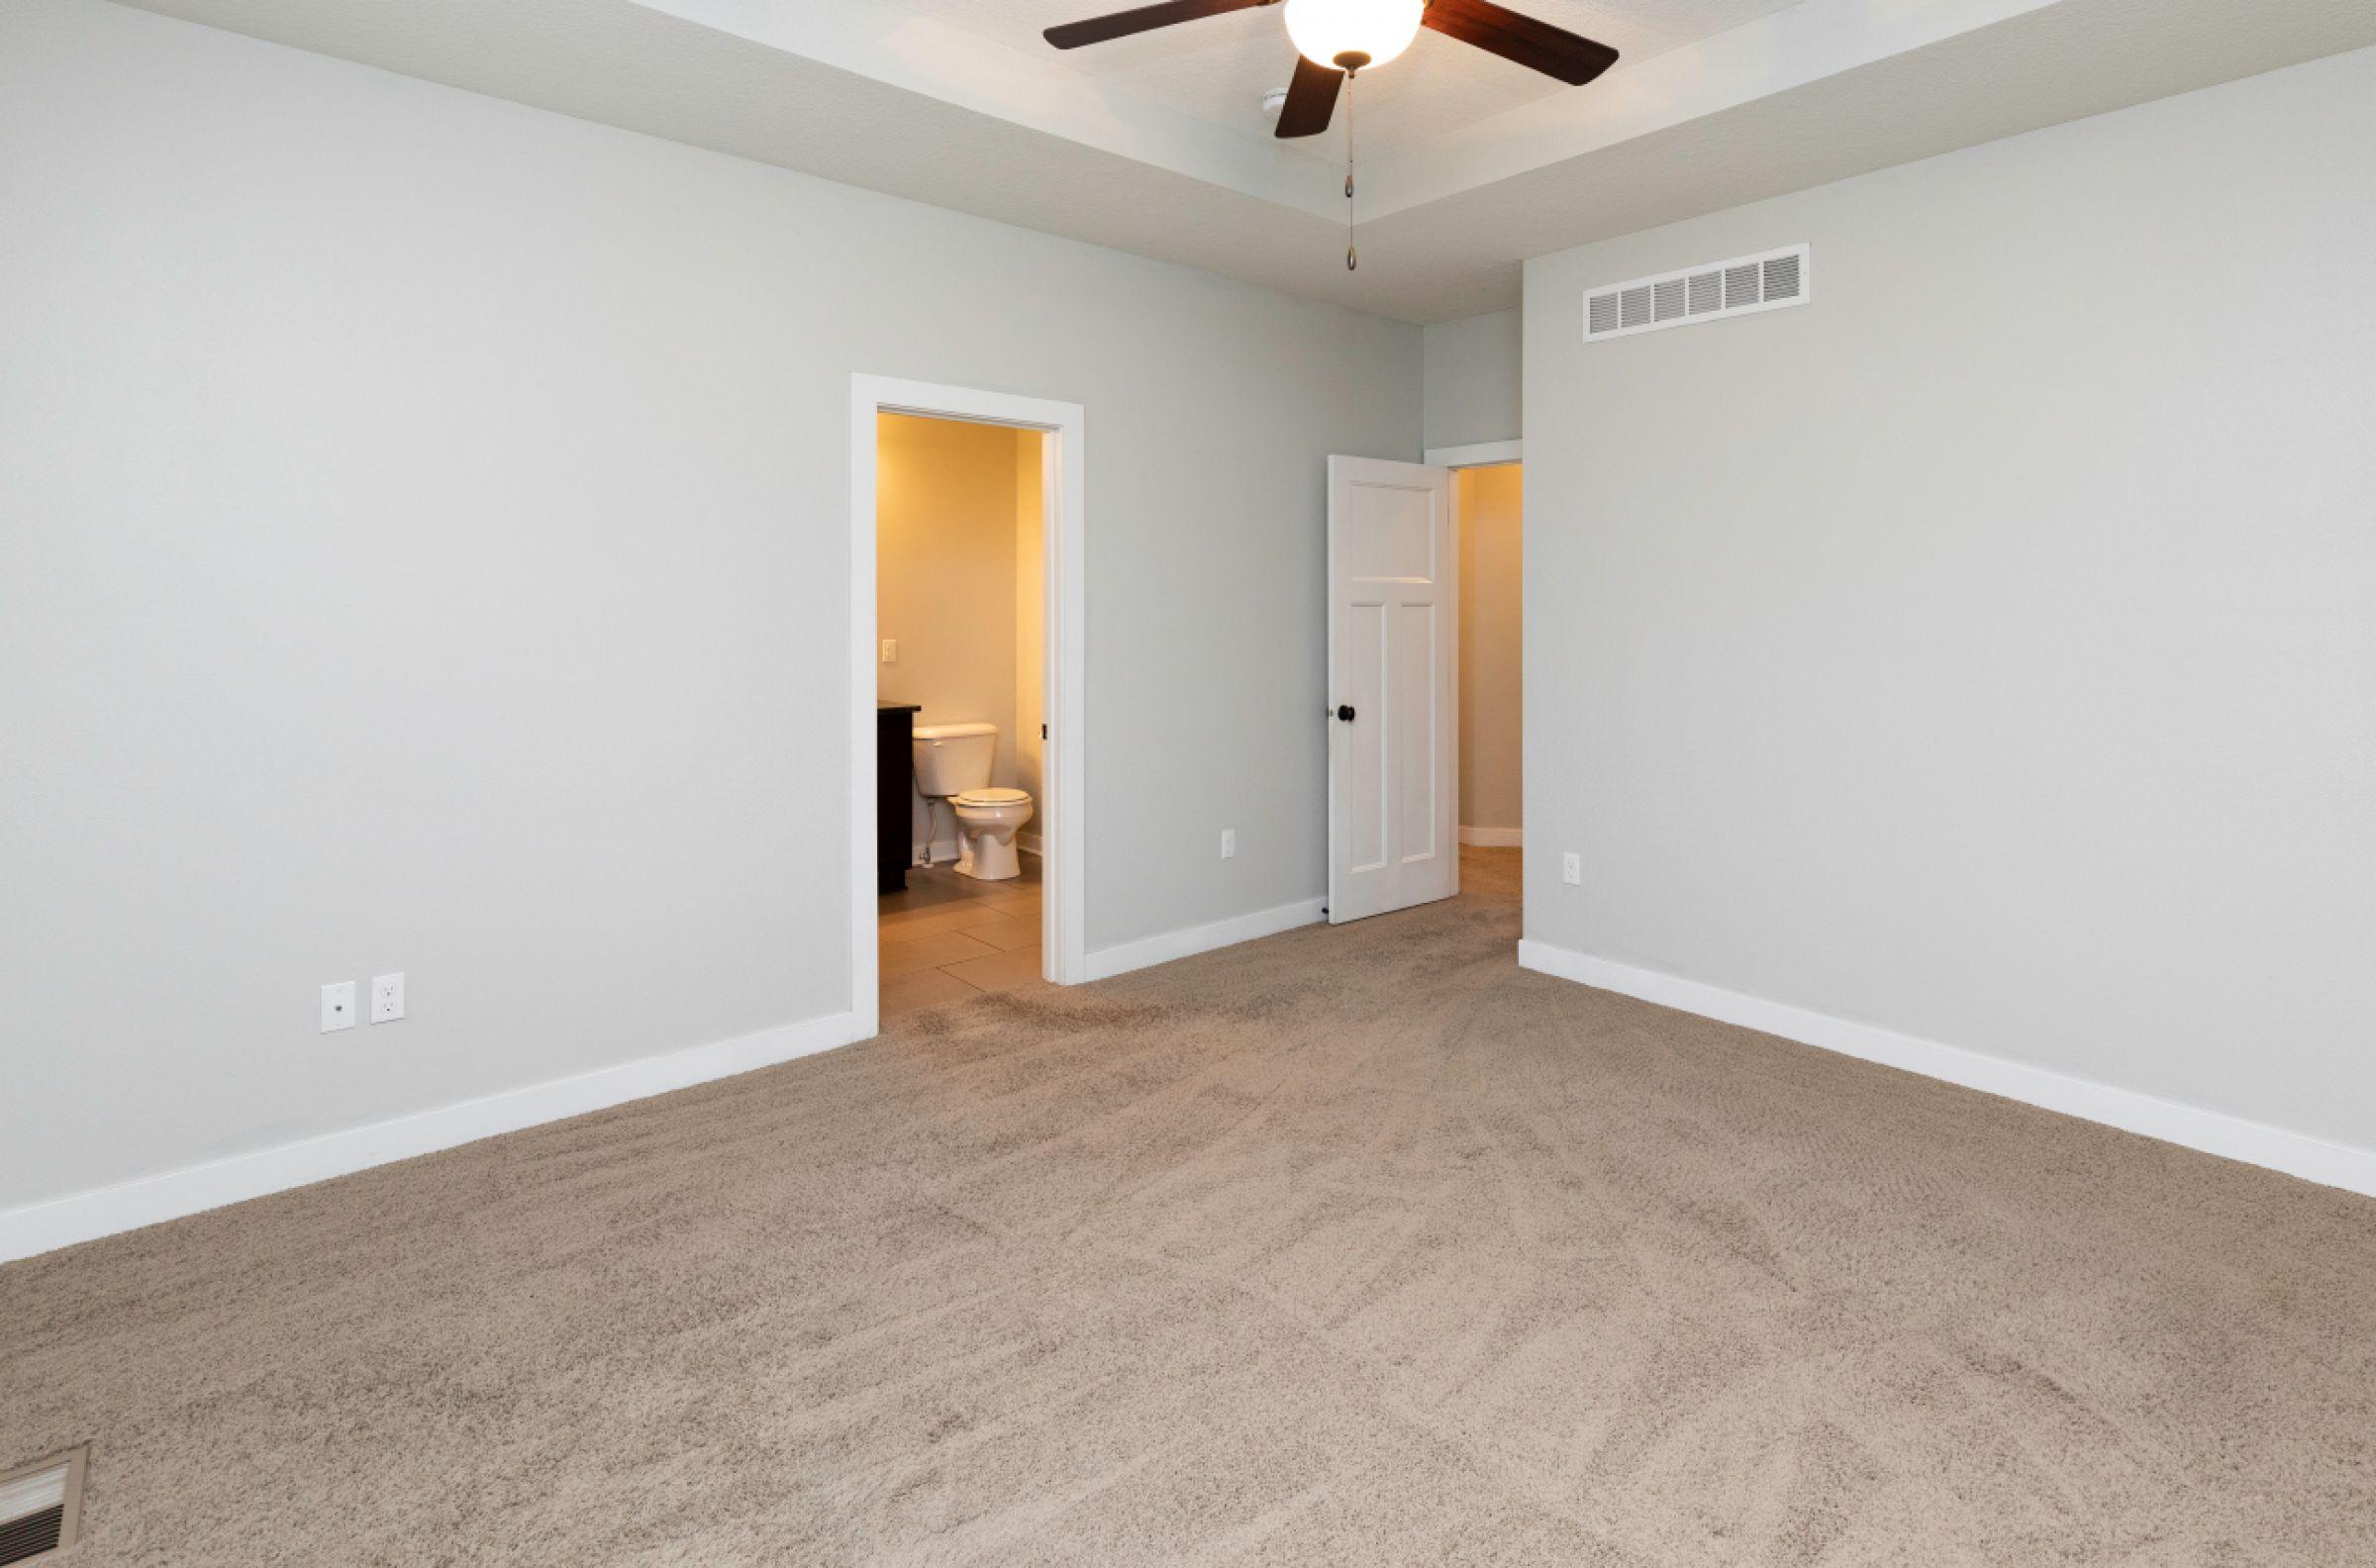 residential-polk-county-iowa-0-acres-listing-number-15273-0-2020-12-07-222420.jpg